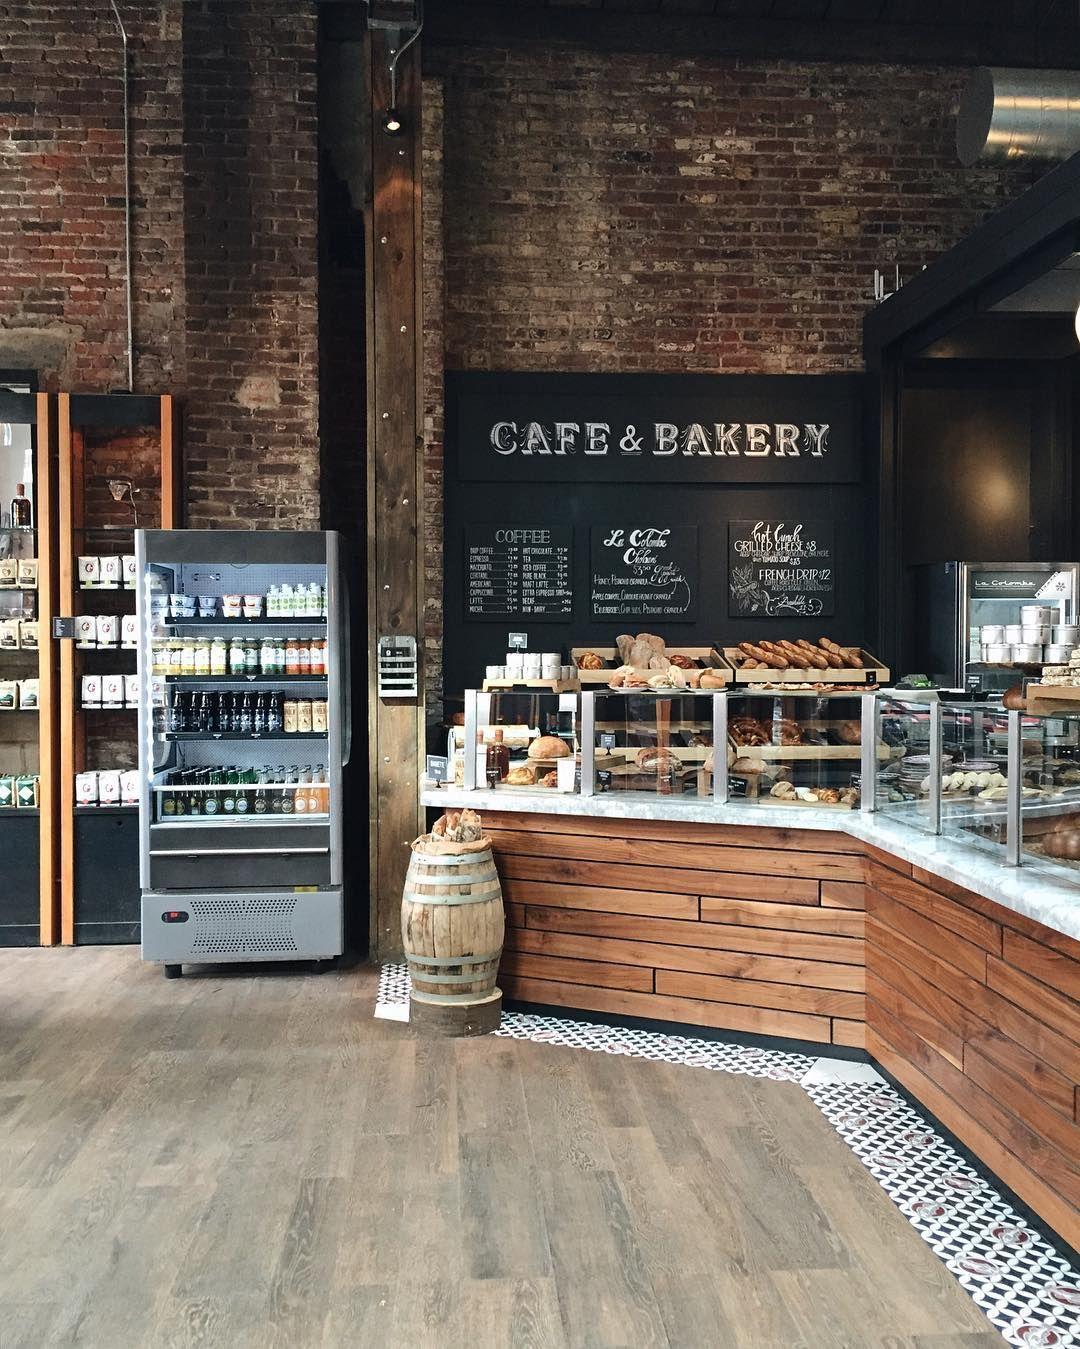 Philadelphia's renowned coffee roasting company, La